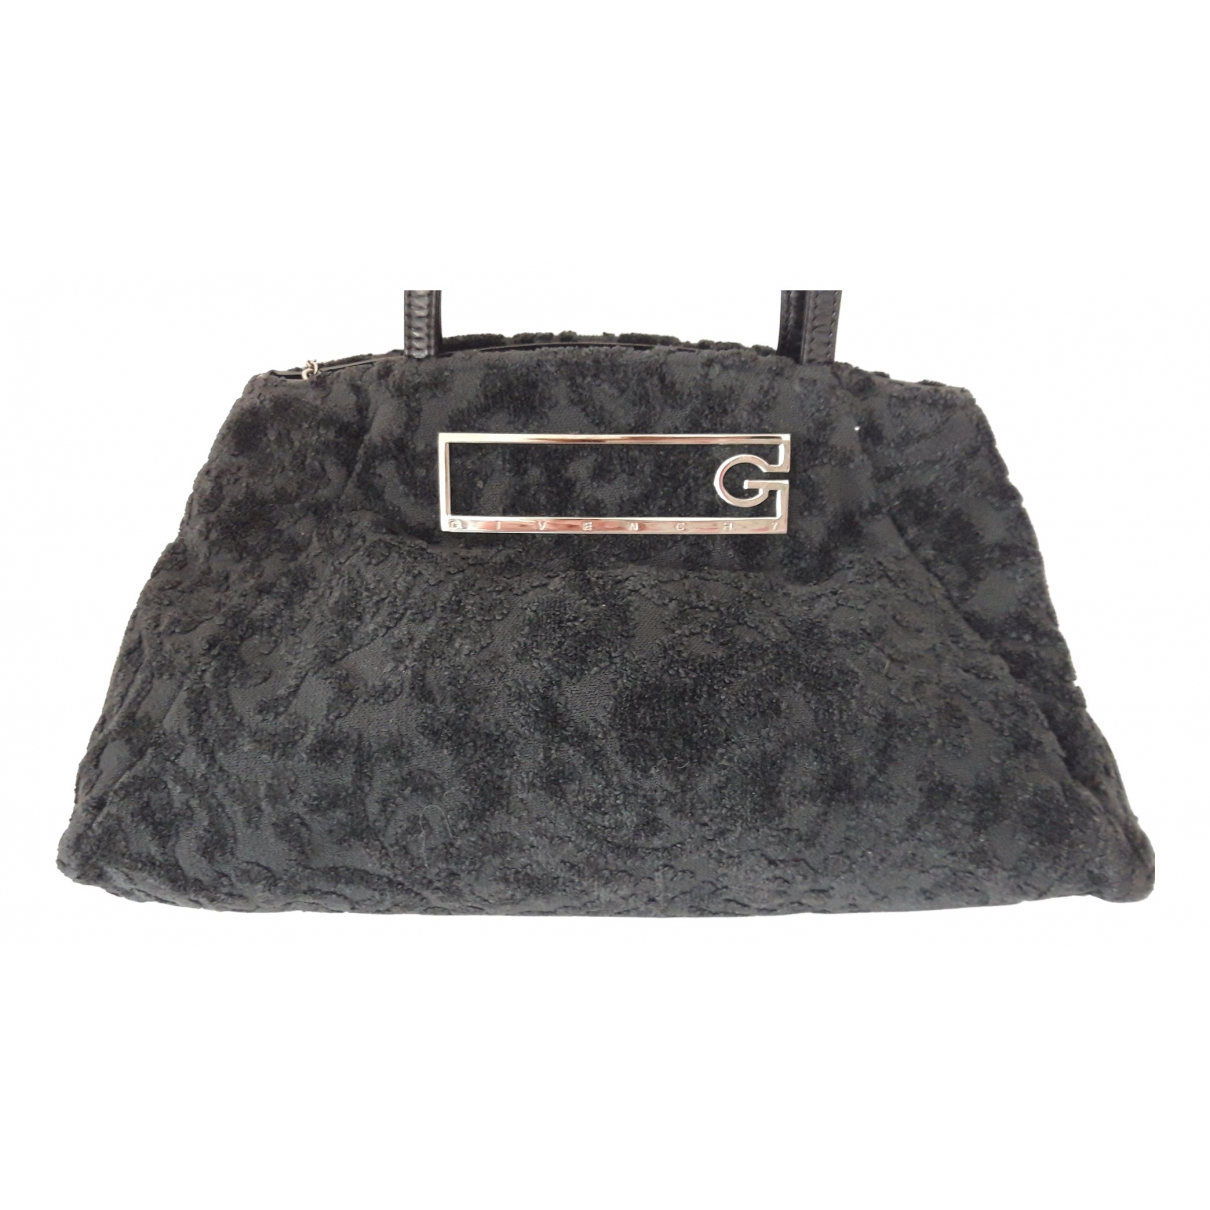 Givenchy \N Black Cotton handbag for Women \N